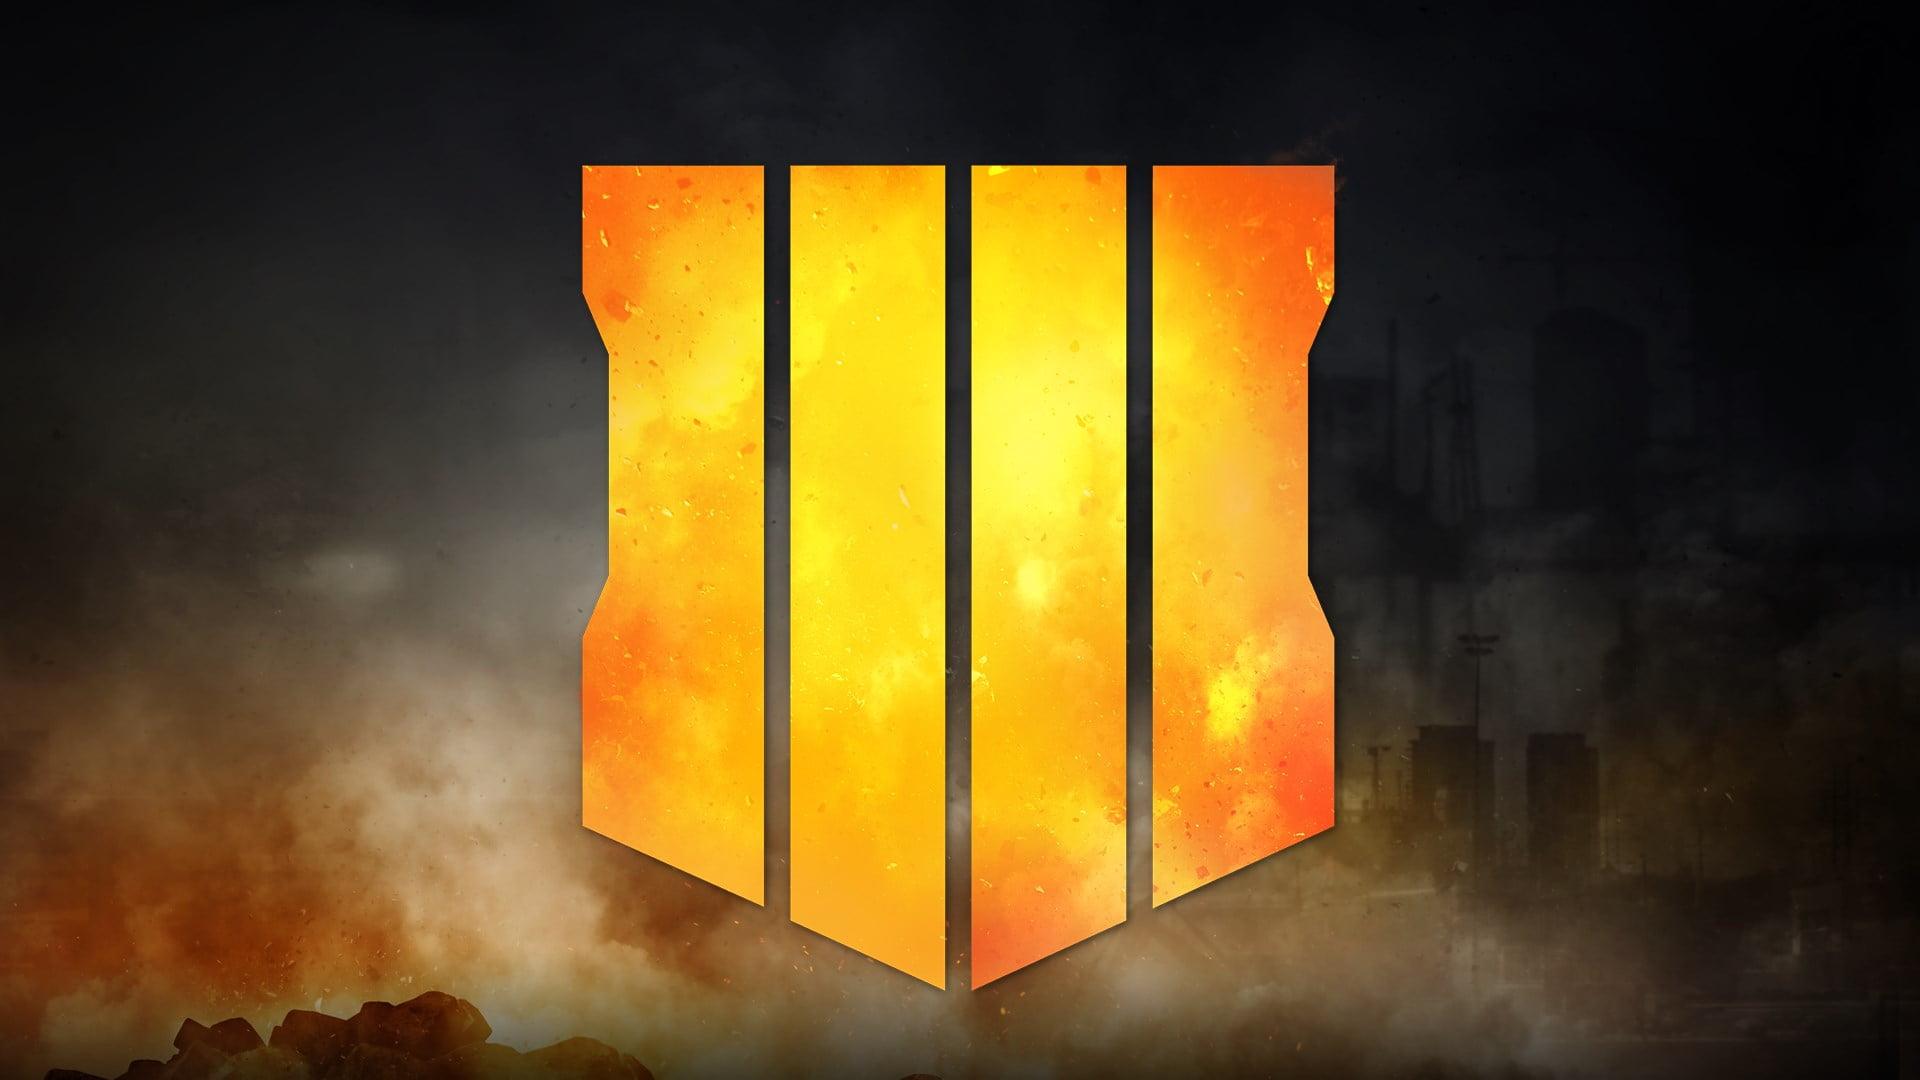 Call Of Duty 2020: Annuncio Imminente? 14 - Hynerd.it